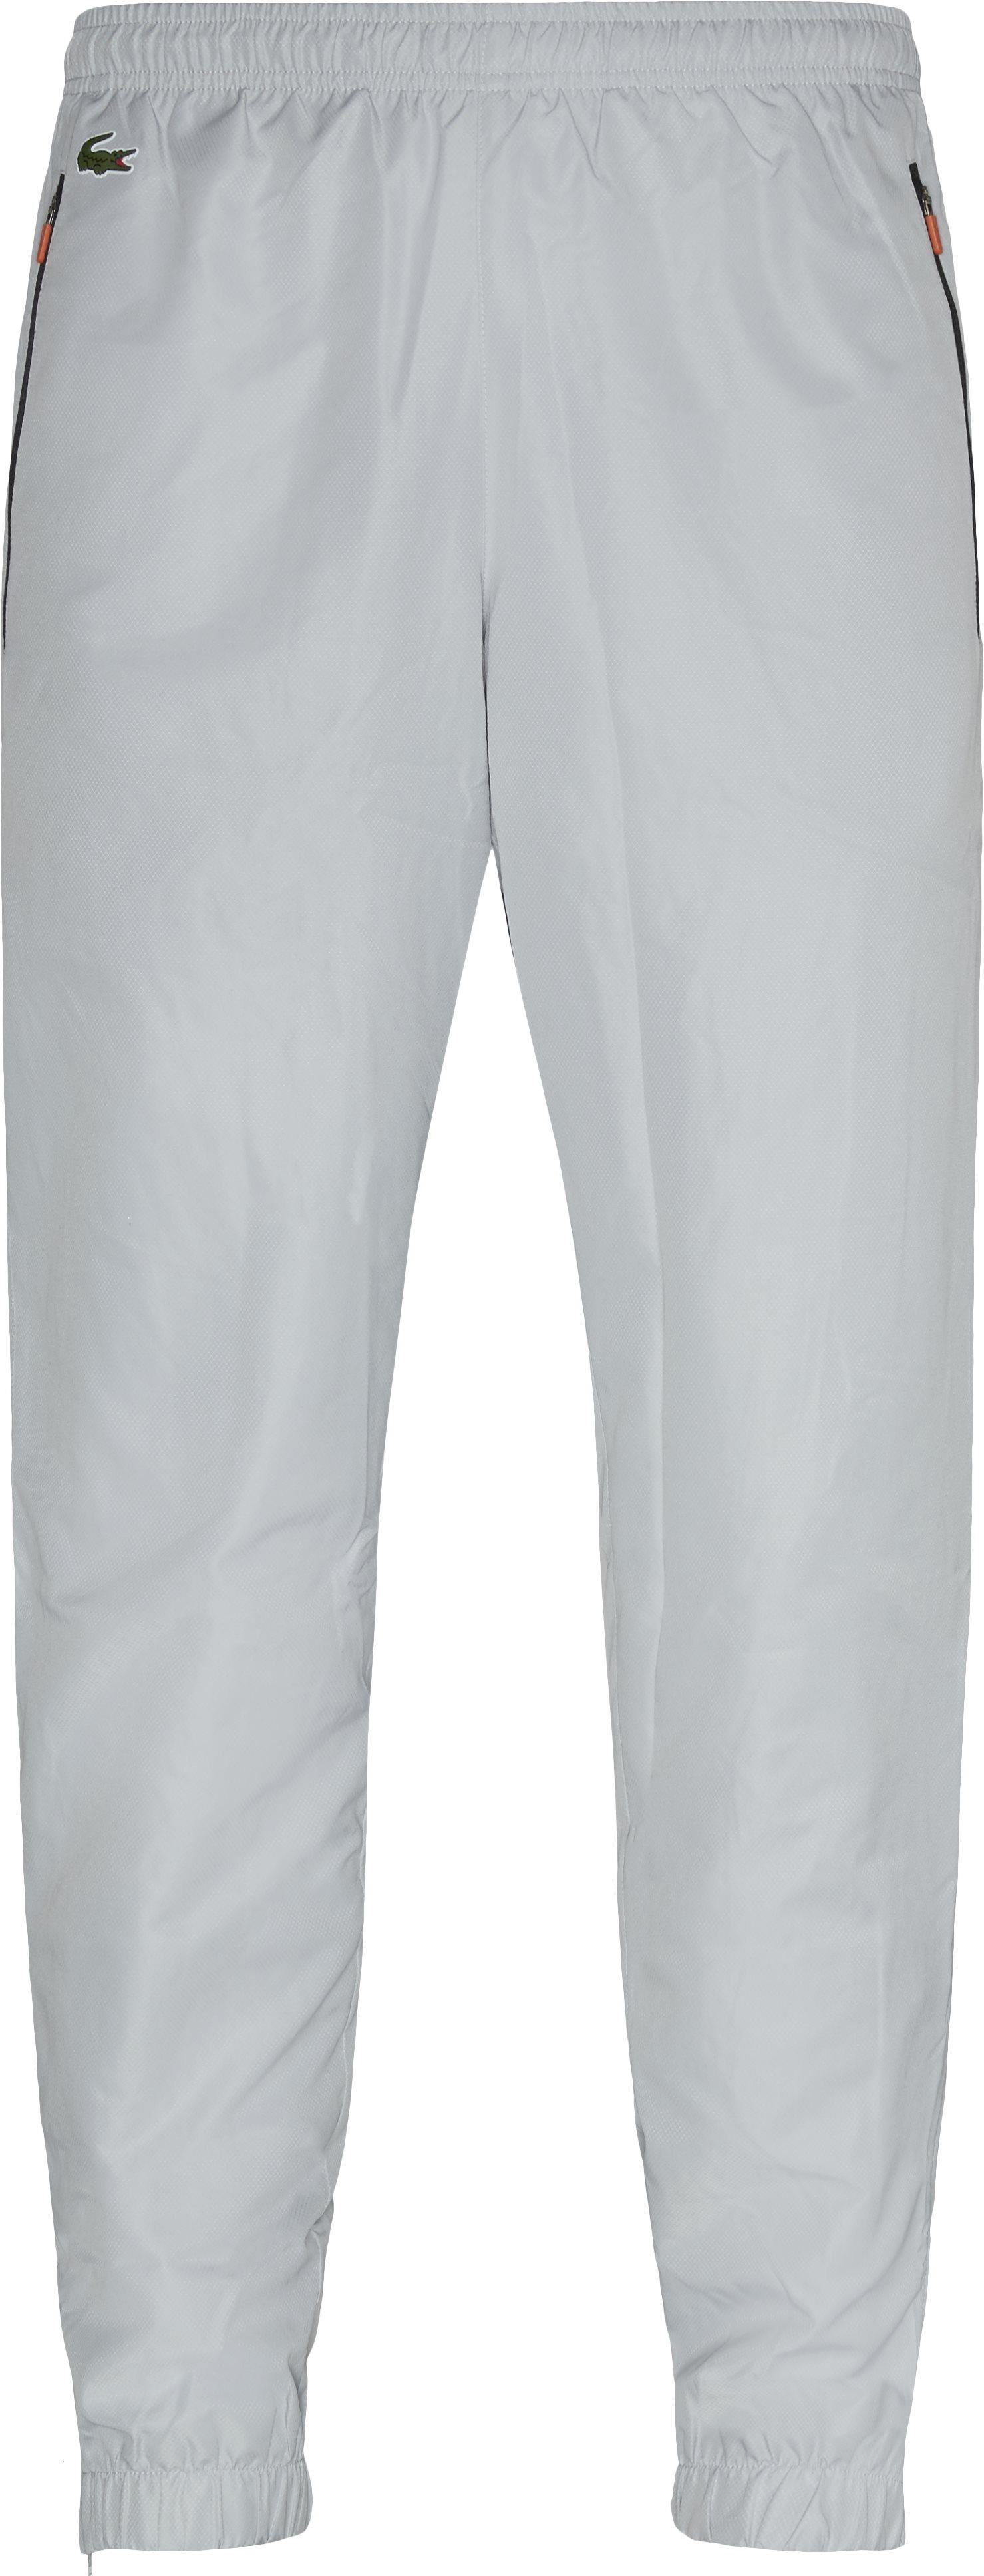 Track Pants - Bukser - Regular fit - Grå